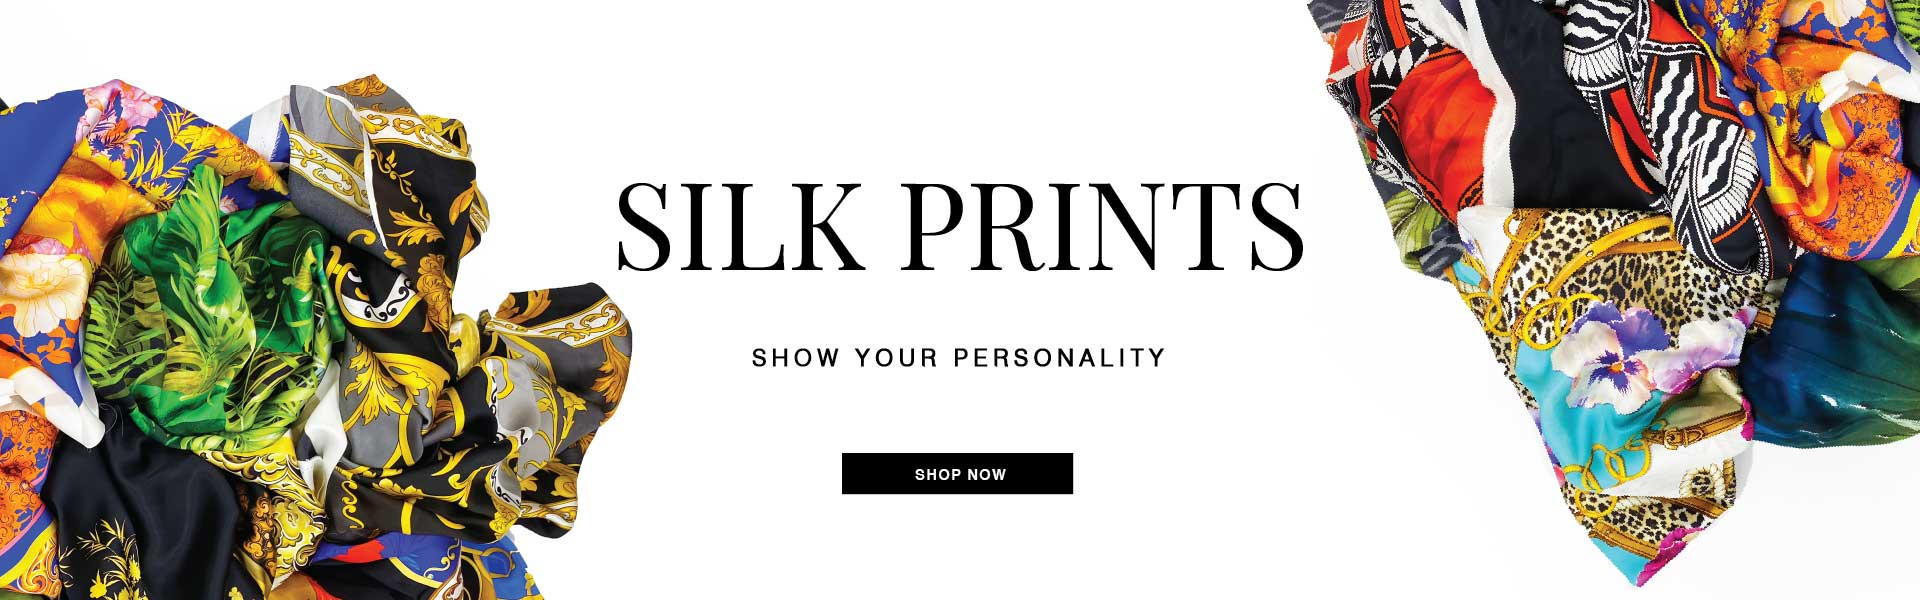 Printed Silk Fabrics - Shop Now!